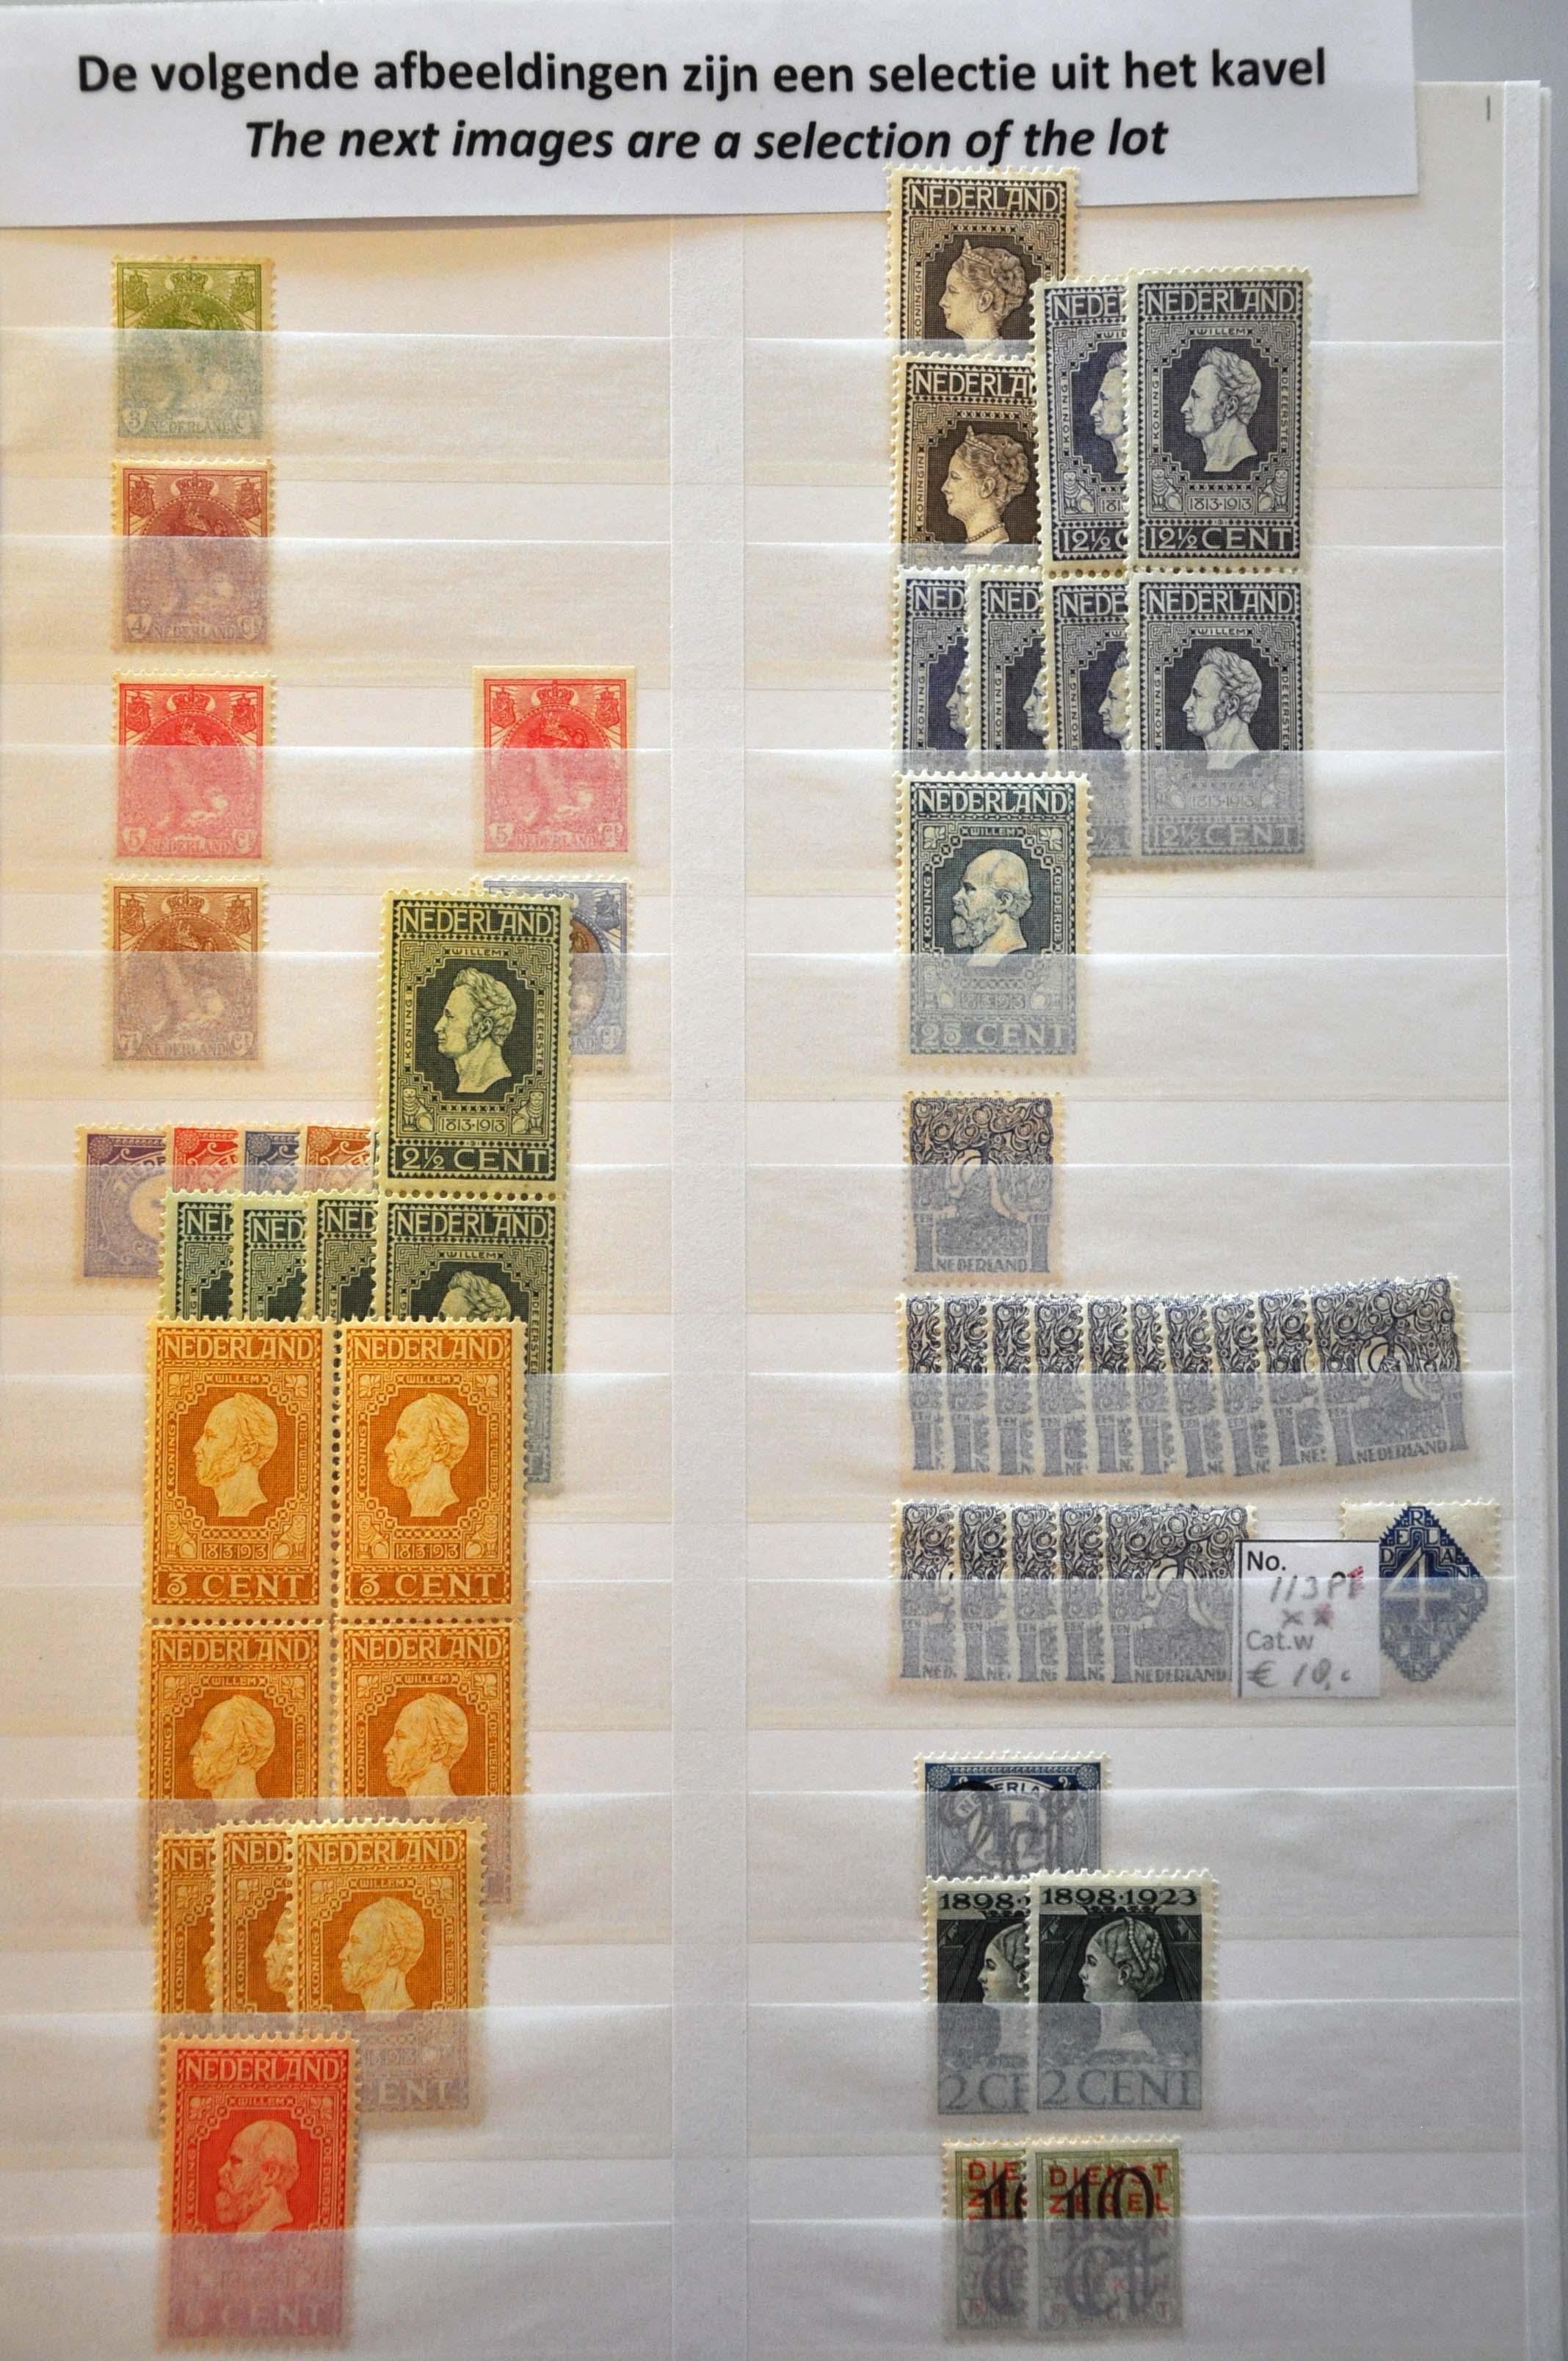 Lot 1636 - Netherlands and former colonies Netherlands -  Corinphila Veilingen Auction 239: General sale